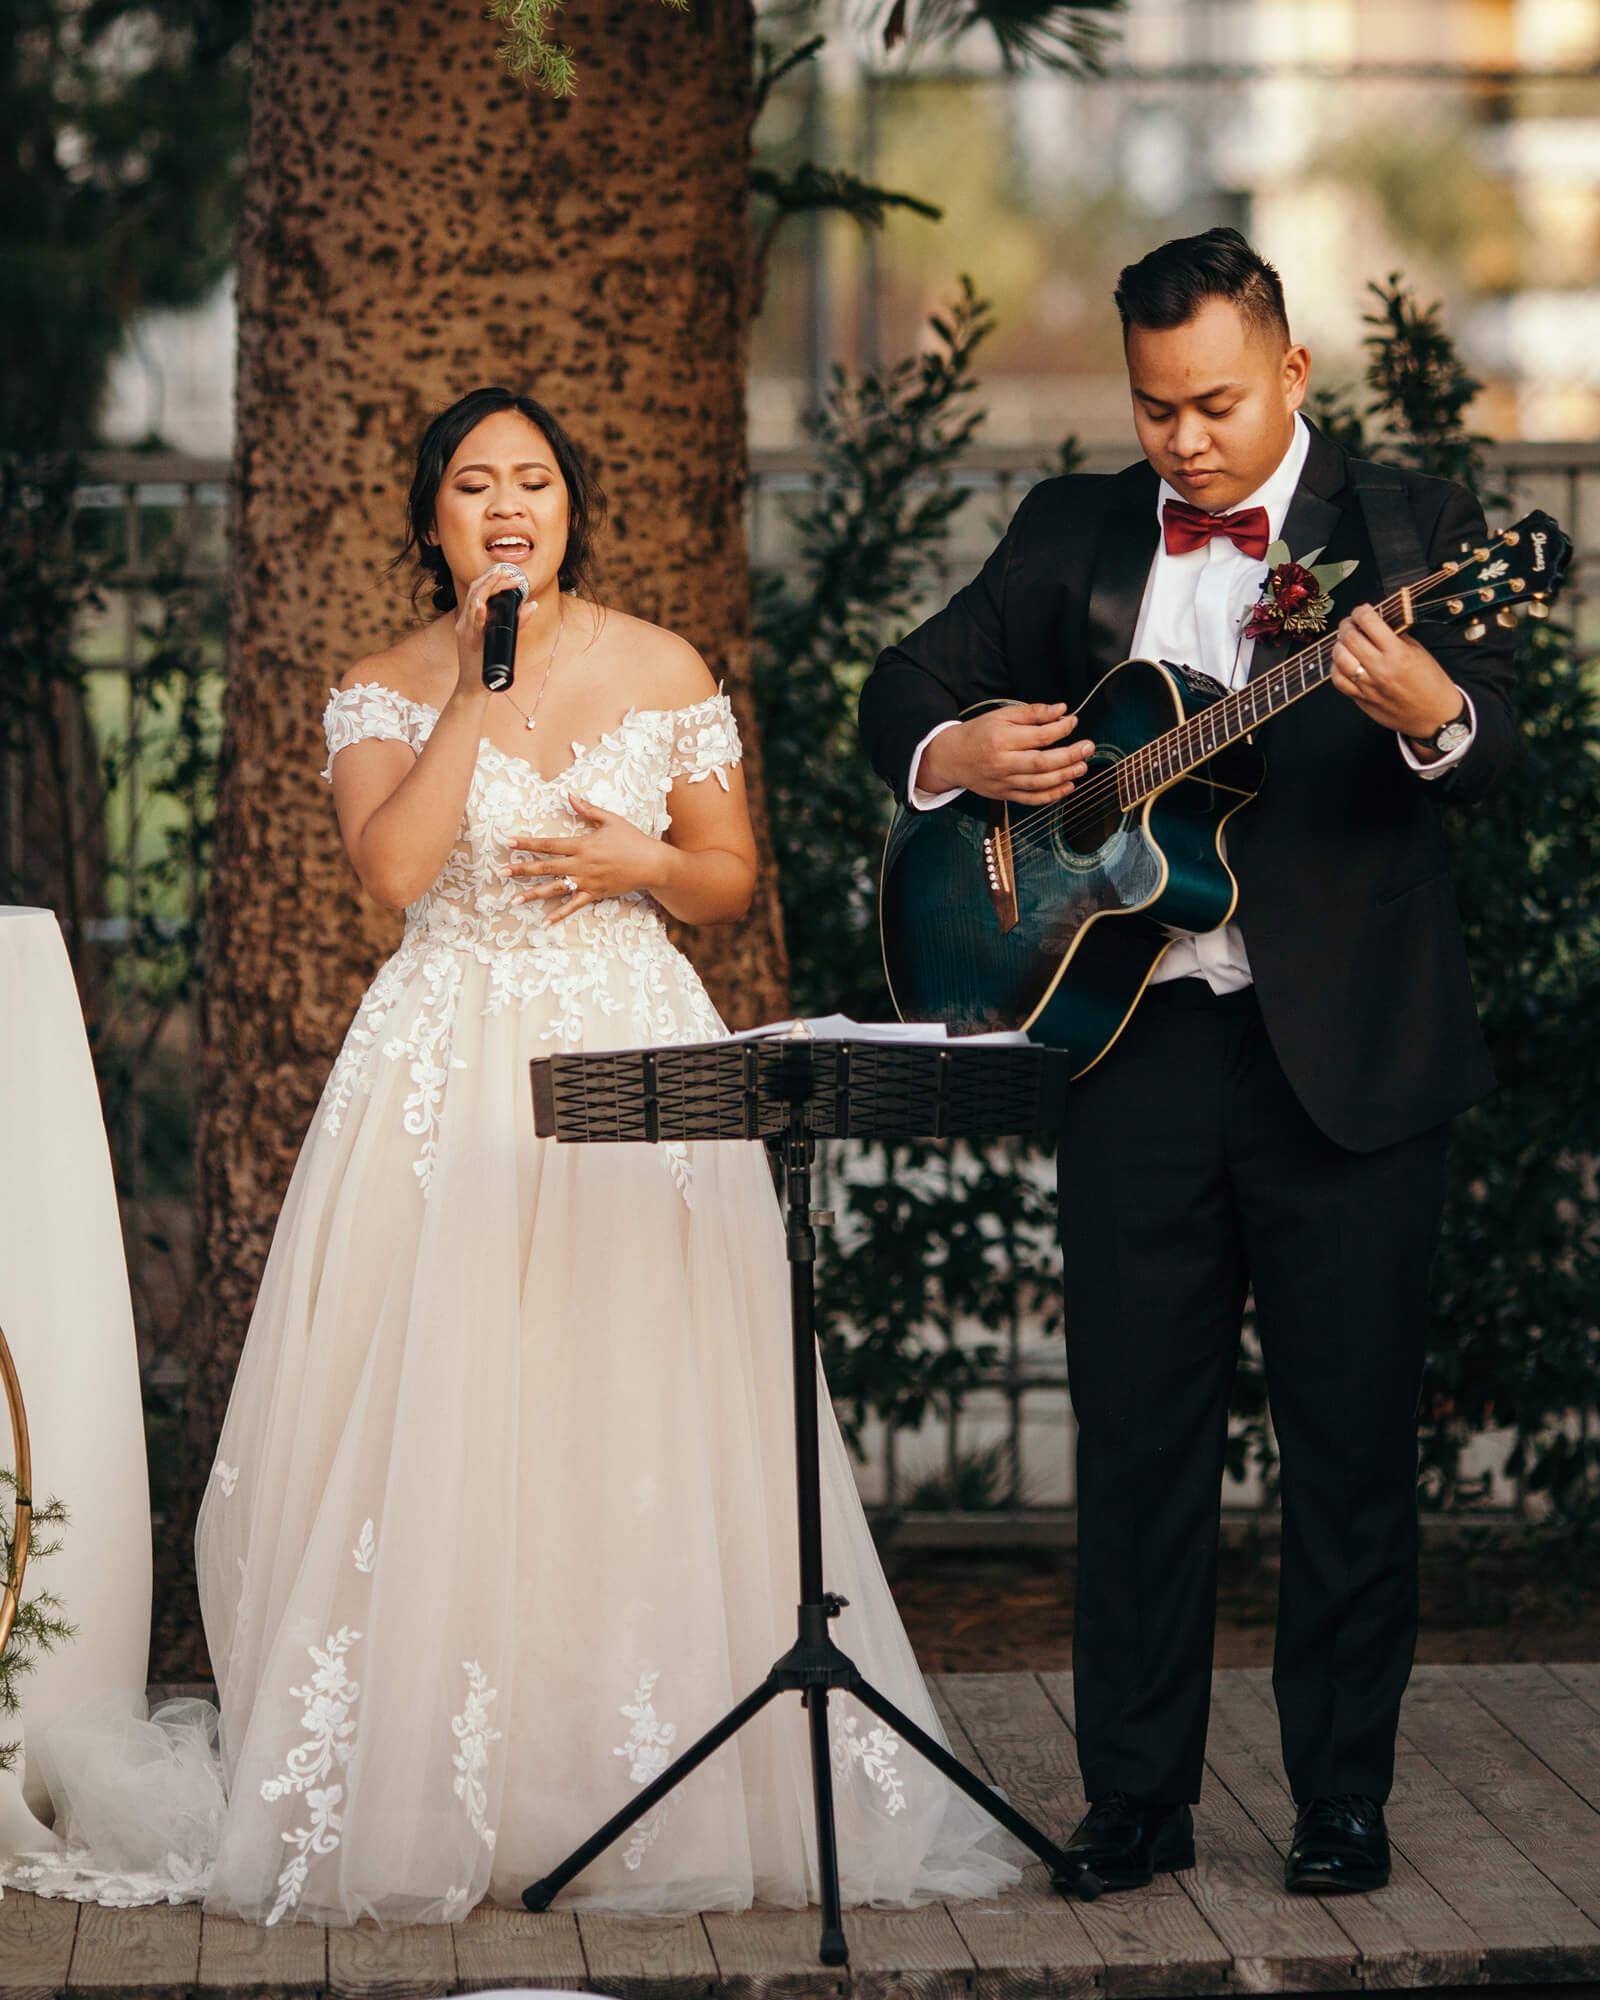 Love Couple Wedding Performace!